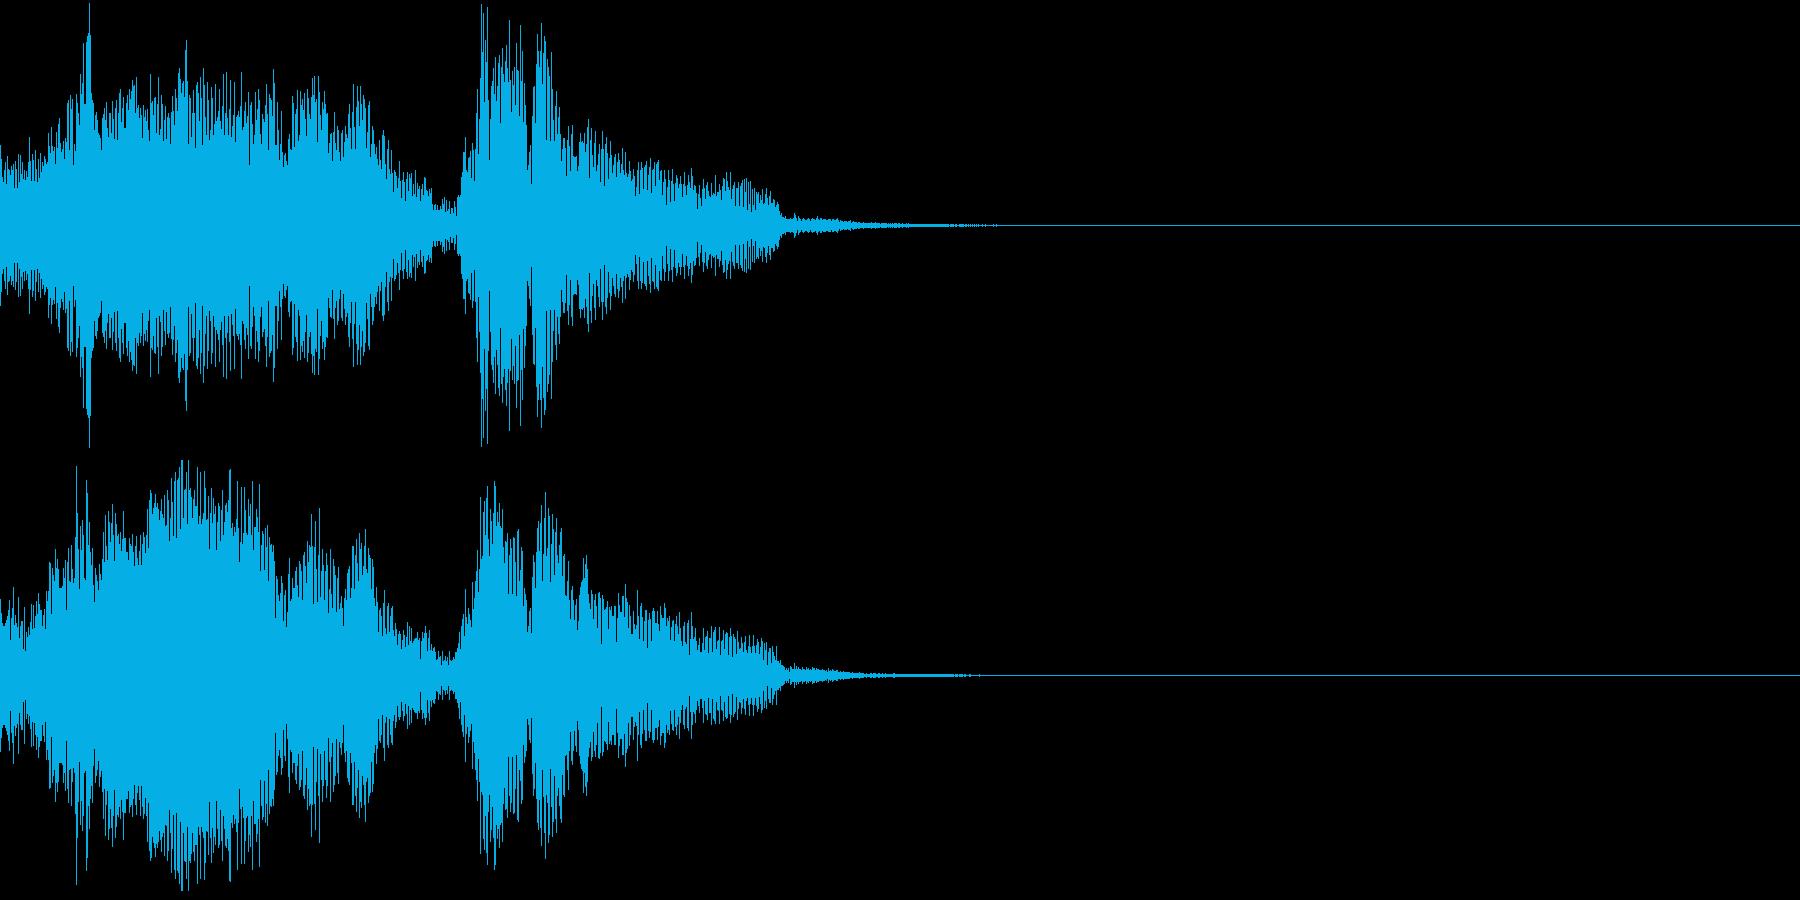 Monster 未知の生物の発する音声2の再生済みの波形